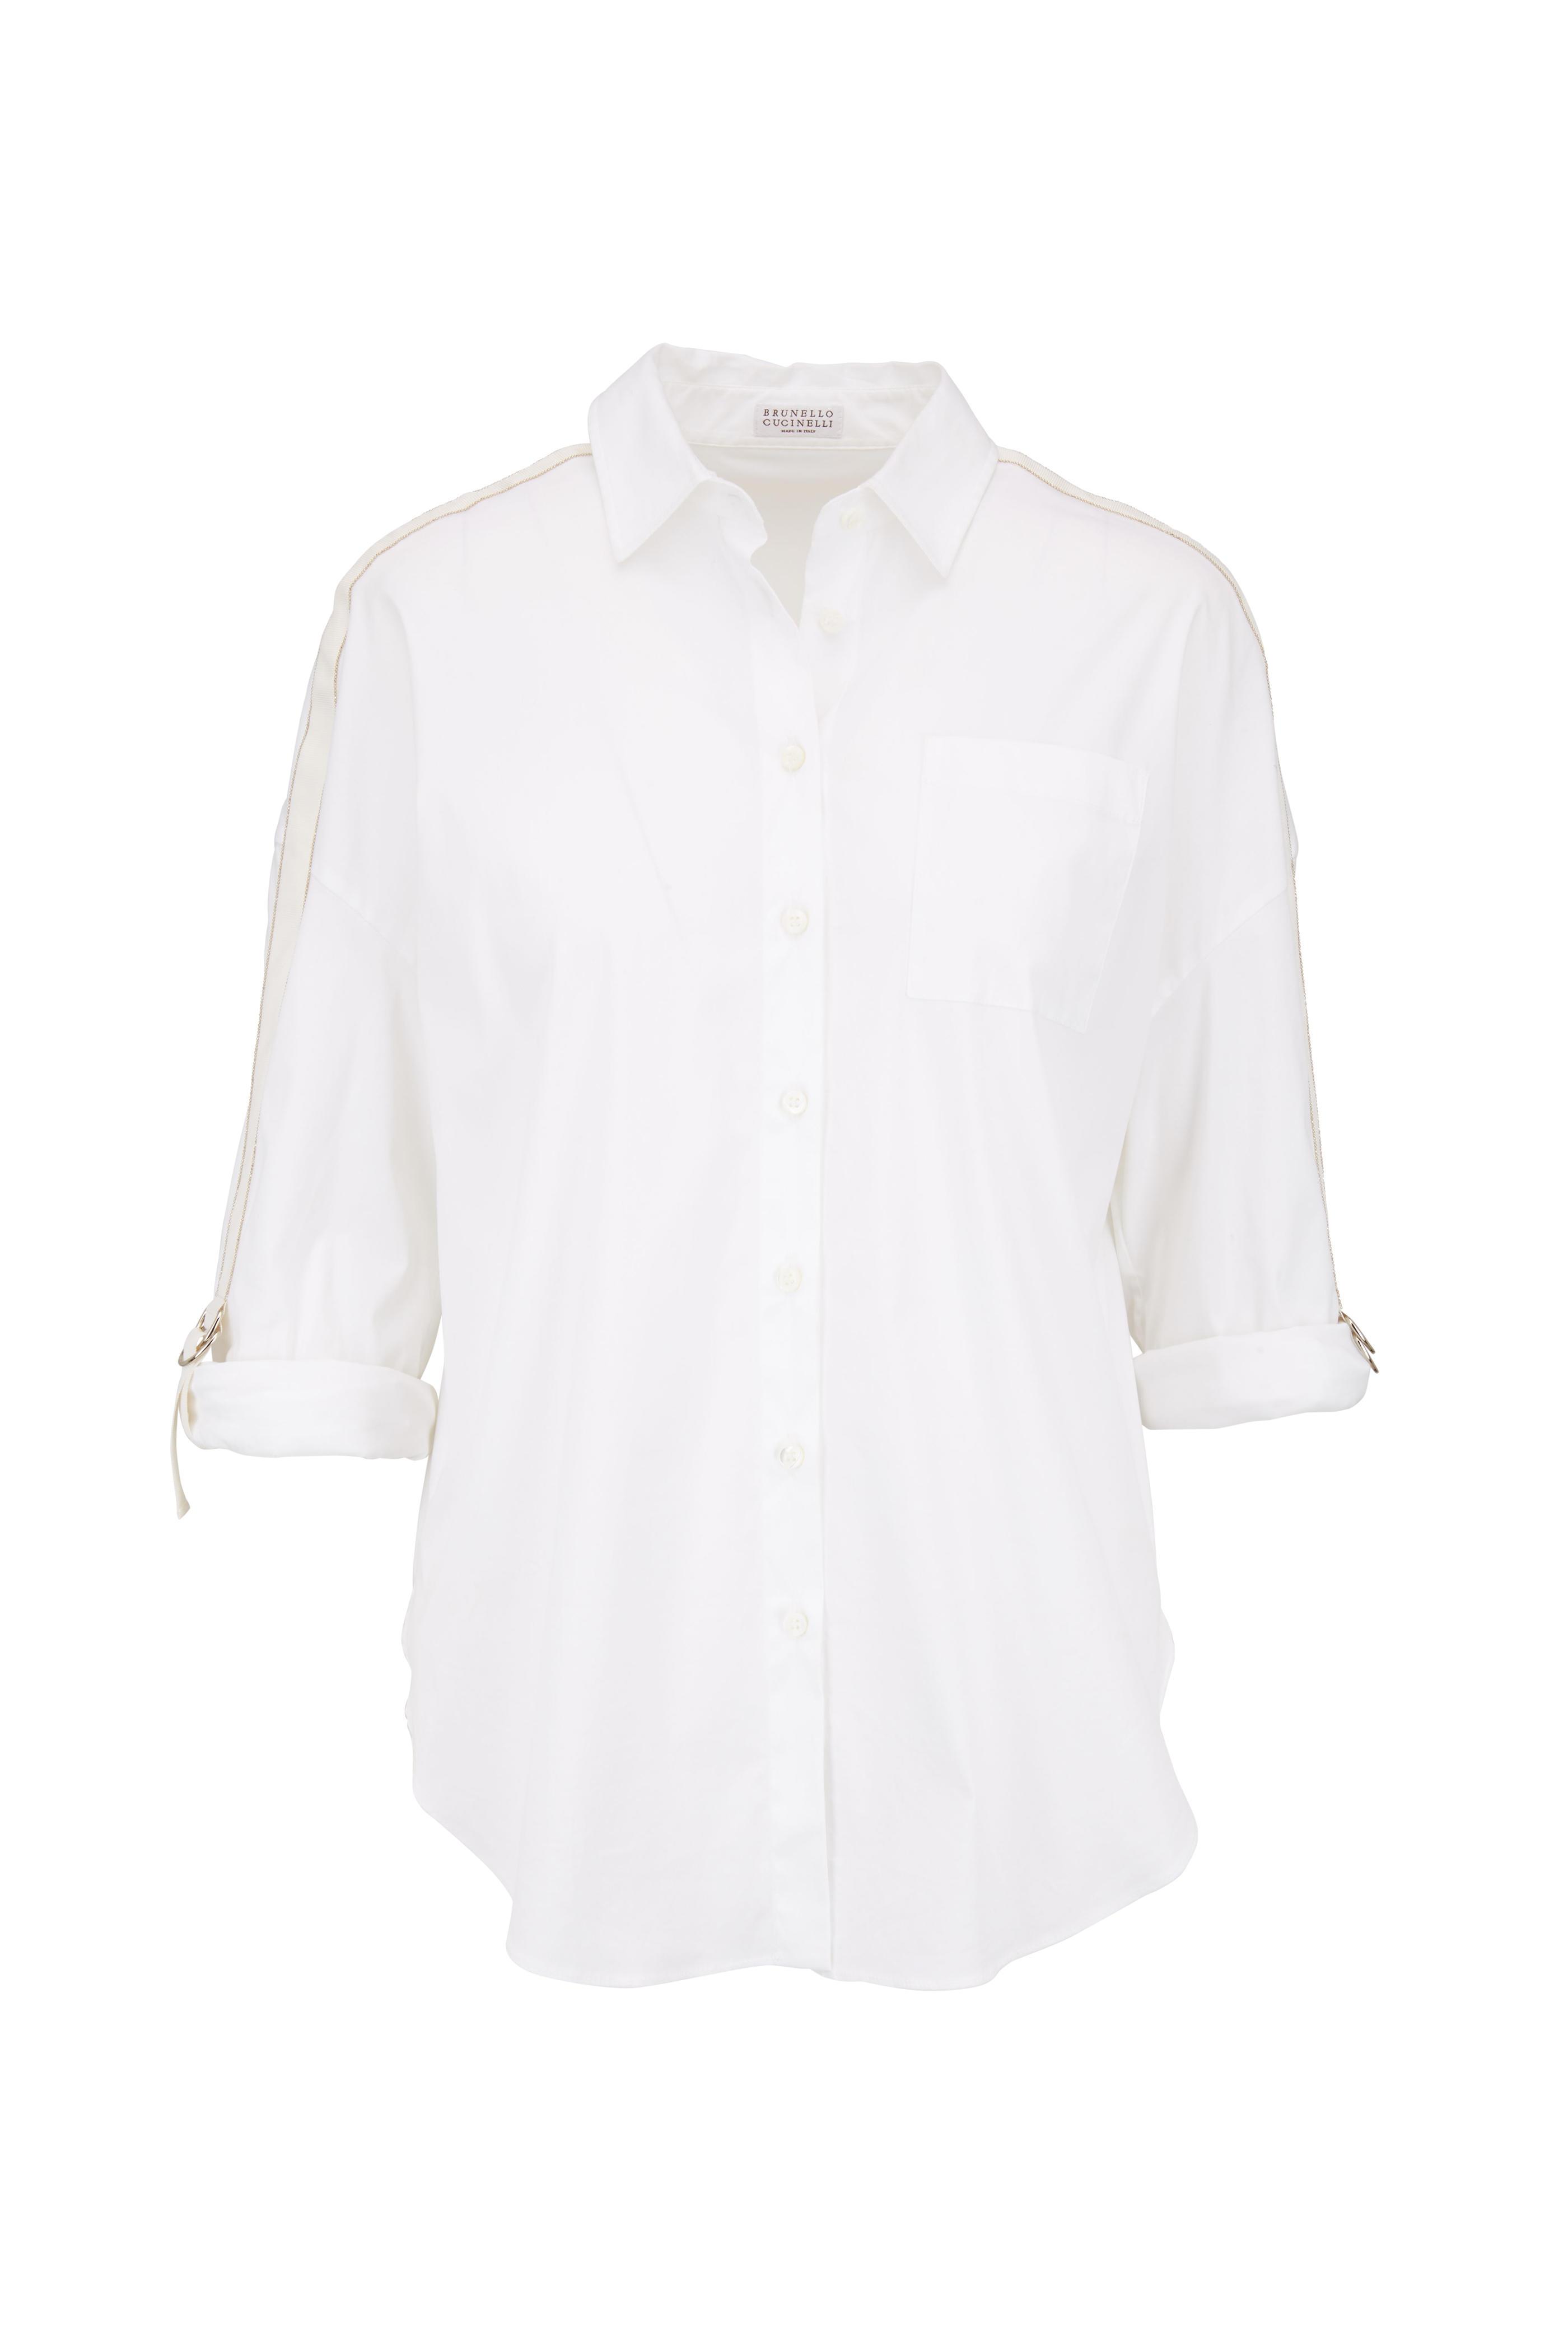 84312364531c5a Brunello Cucinelli - White   Gold Monili Sleeve Blouse